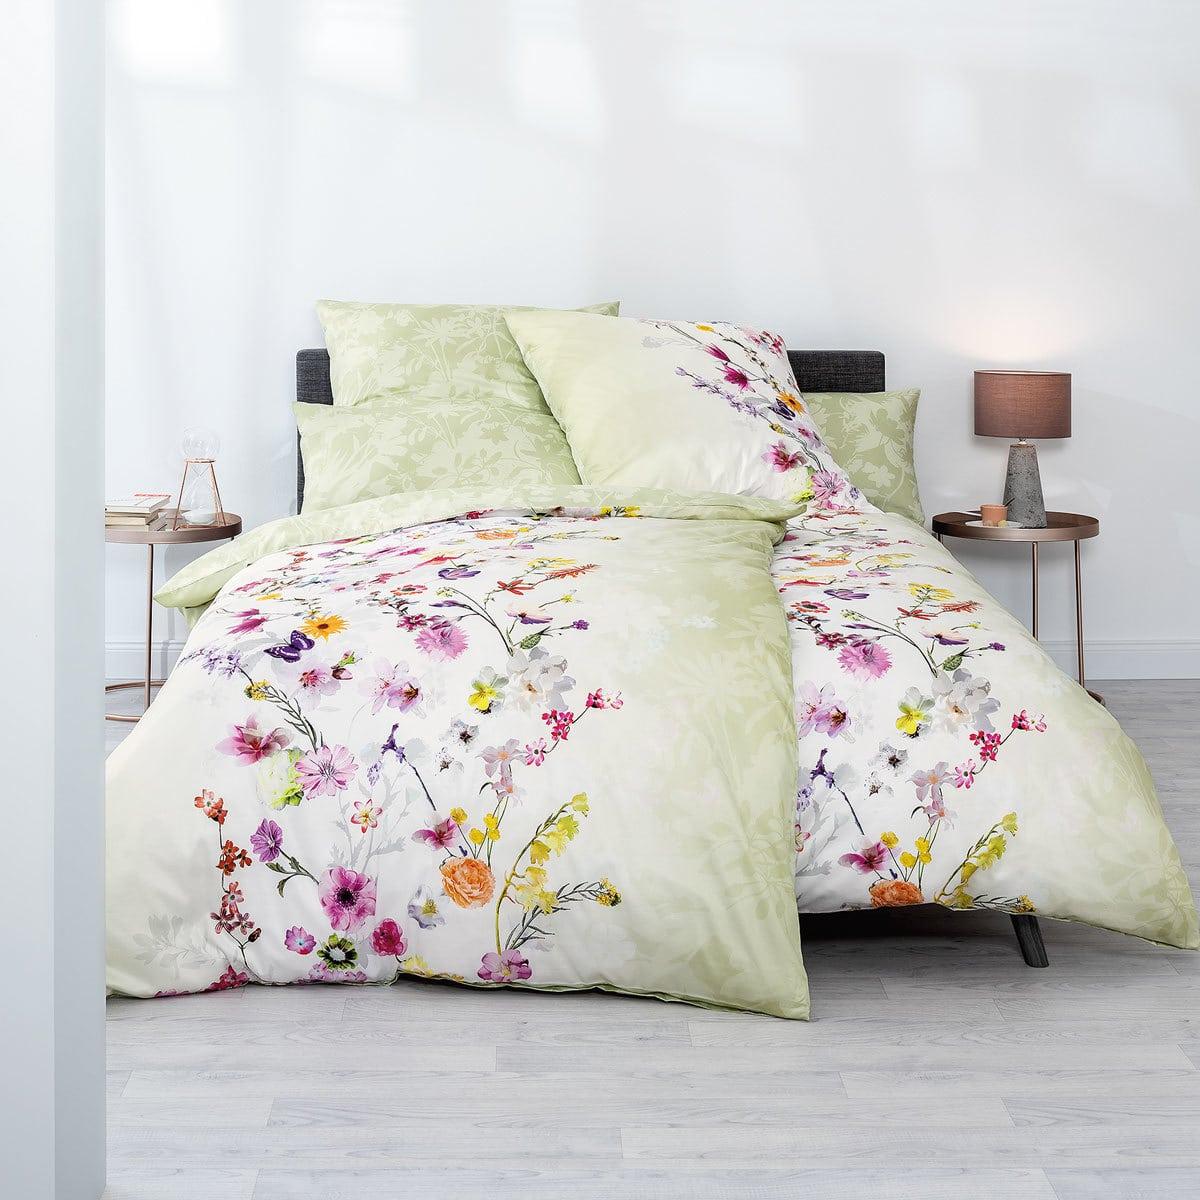 irisette kinder duo steppbett paul und paulinchen dr. Black Bedroom Furniture Sets. Home Design Ideas